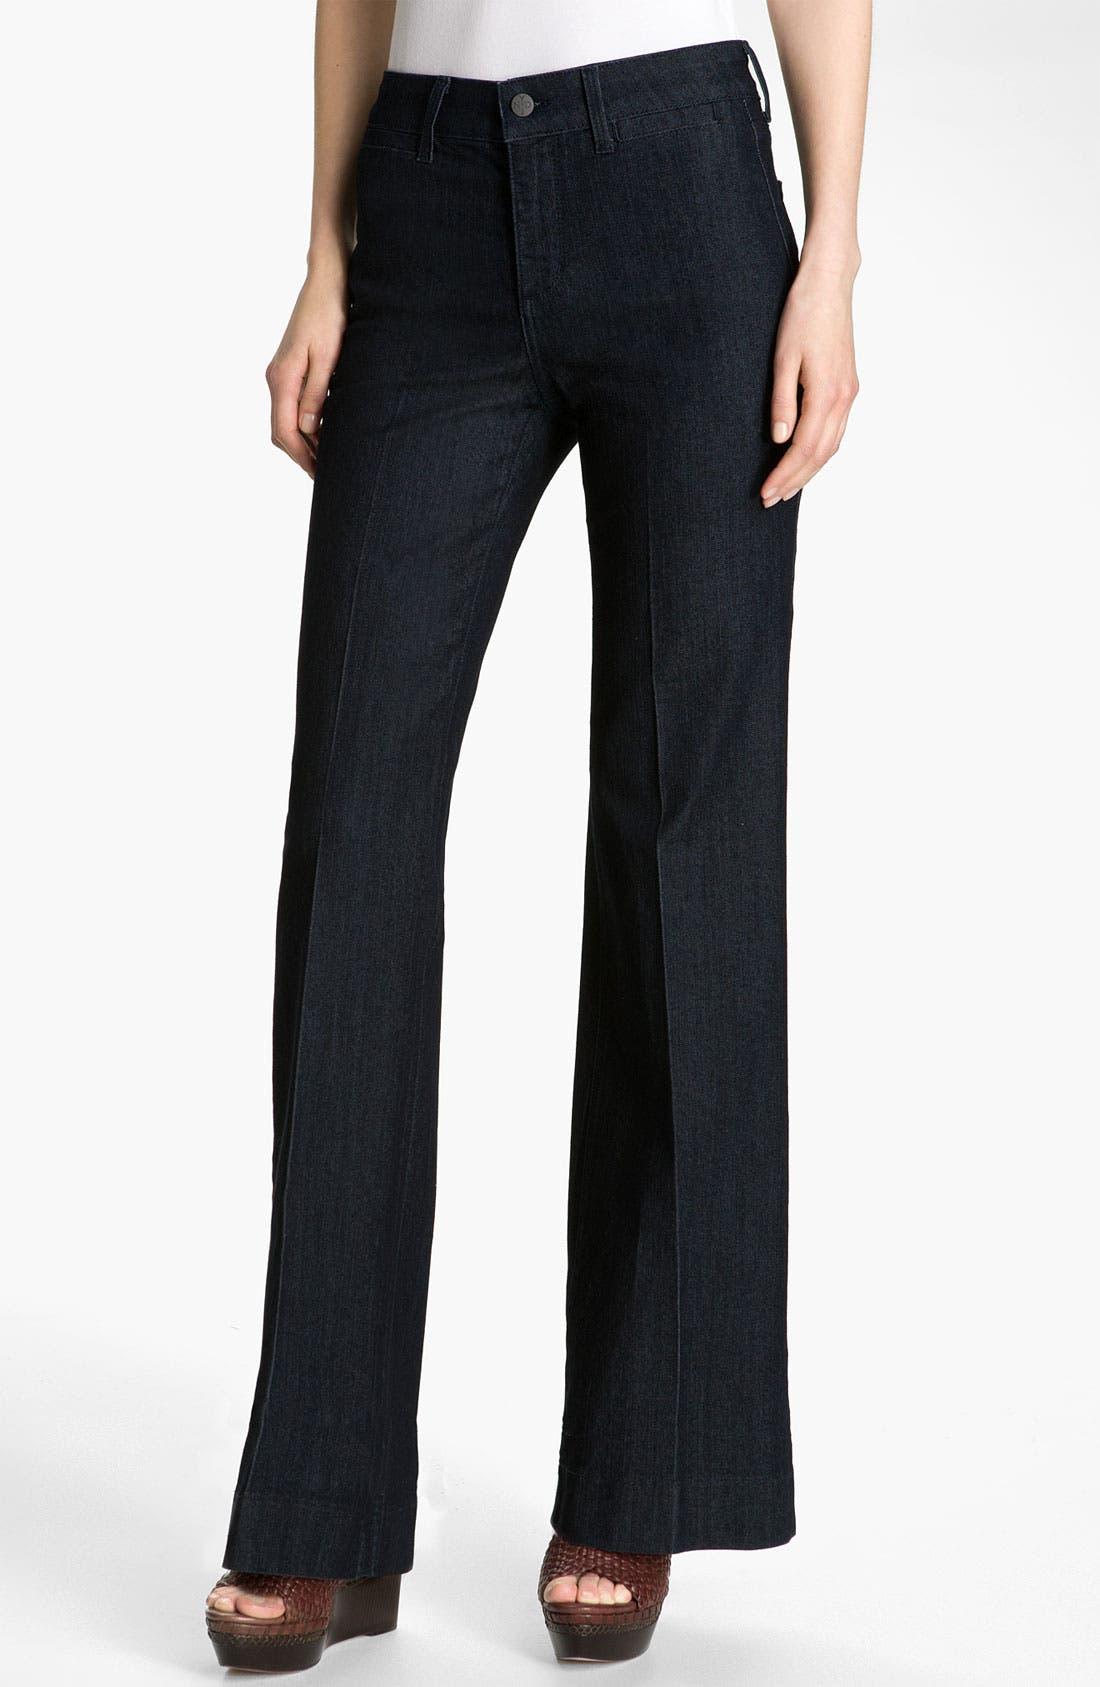 Alternate Image 1 Selected - NYDJ 'Greta' Trouser Jeans (Petite)